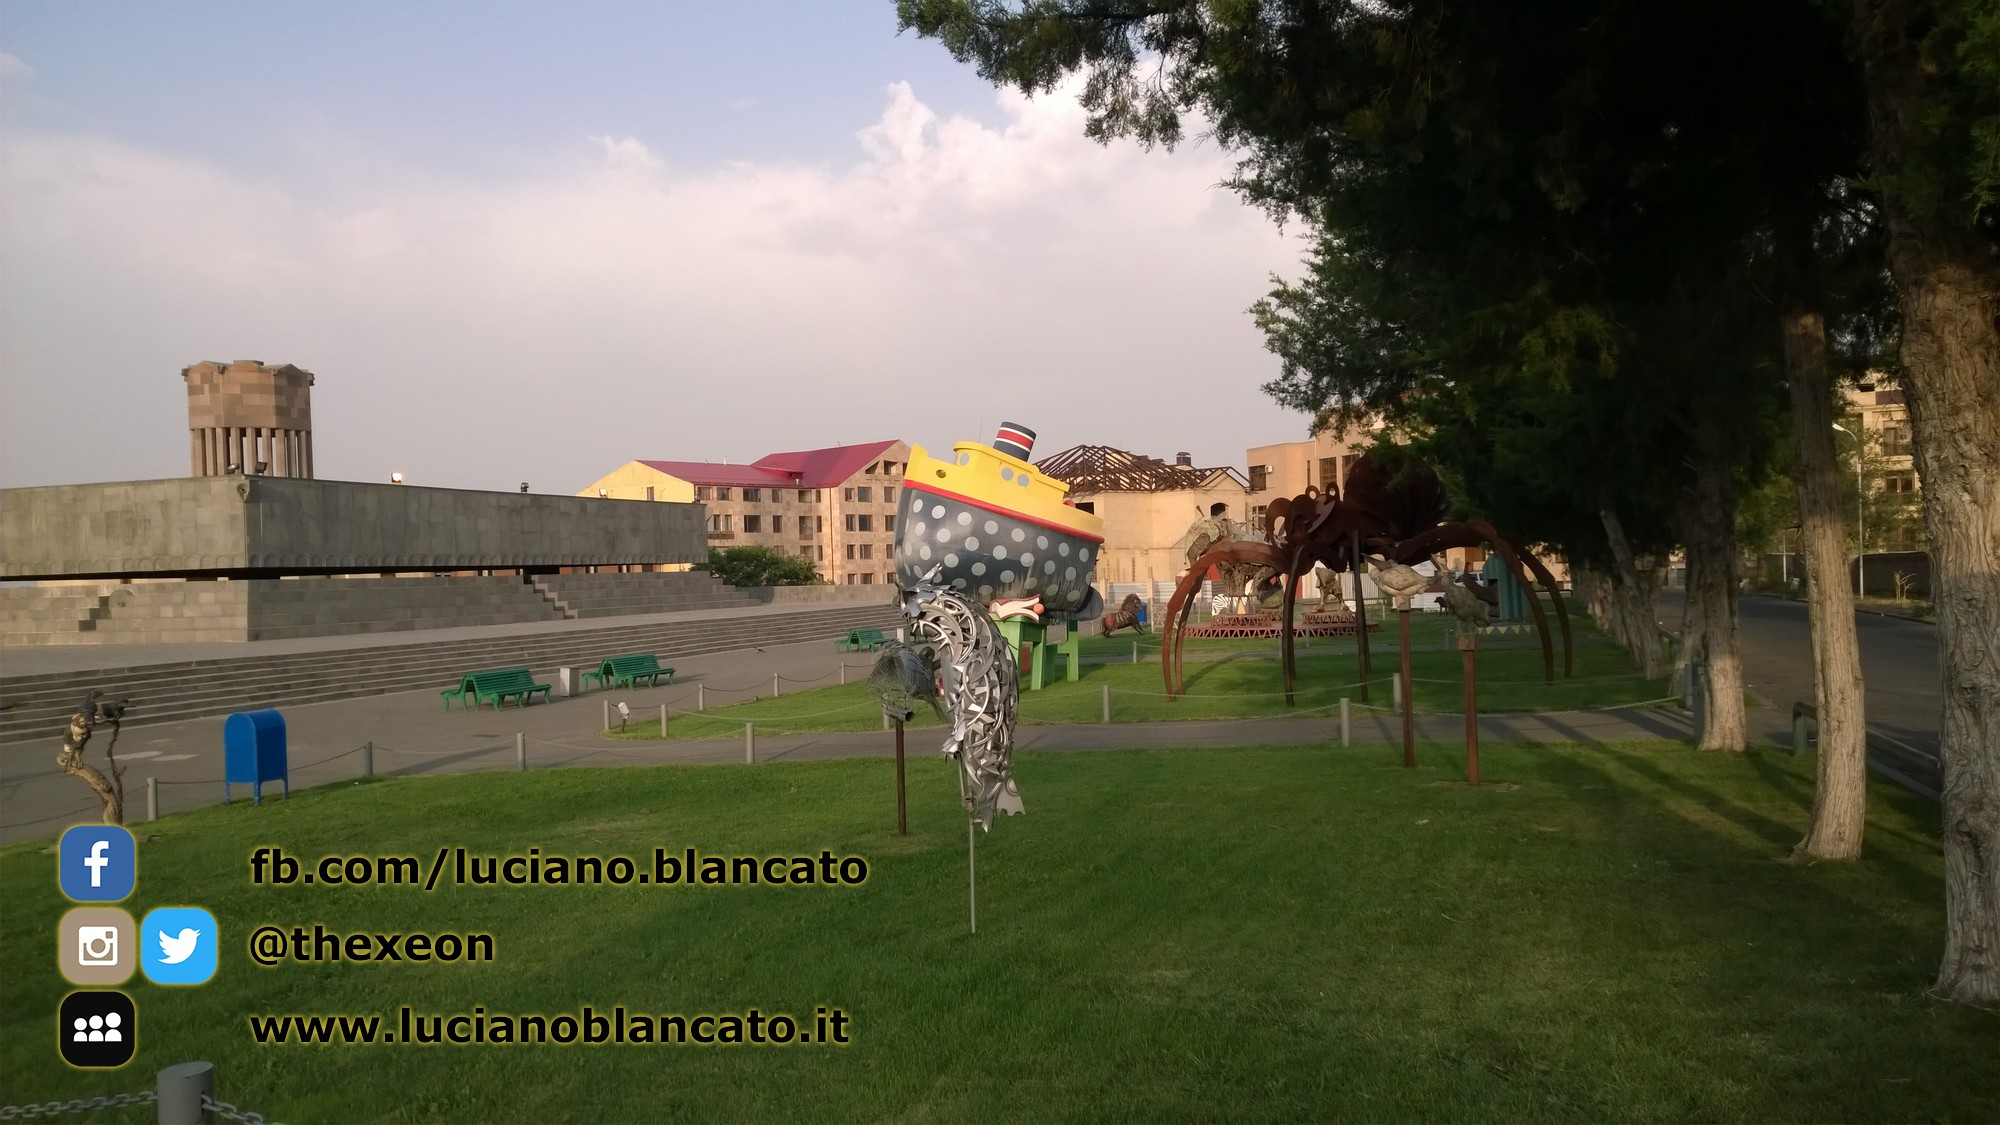 Piazza/Parco ad Erevan